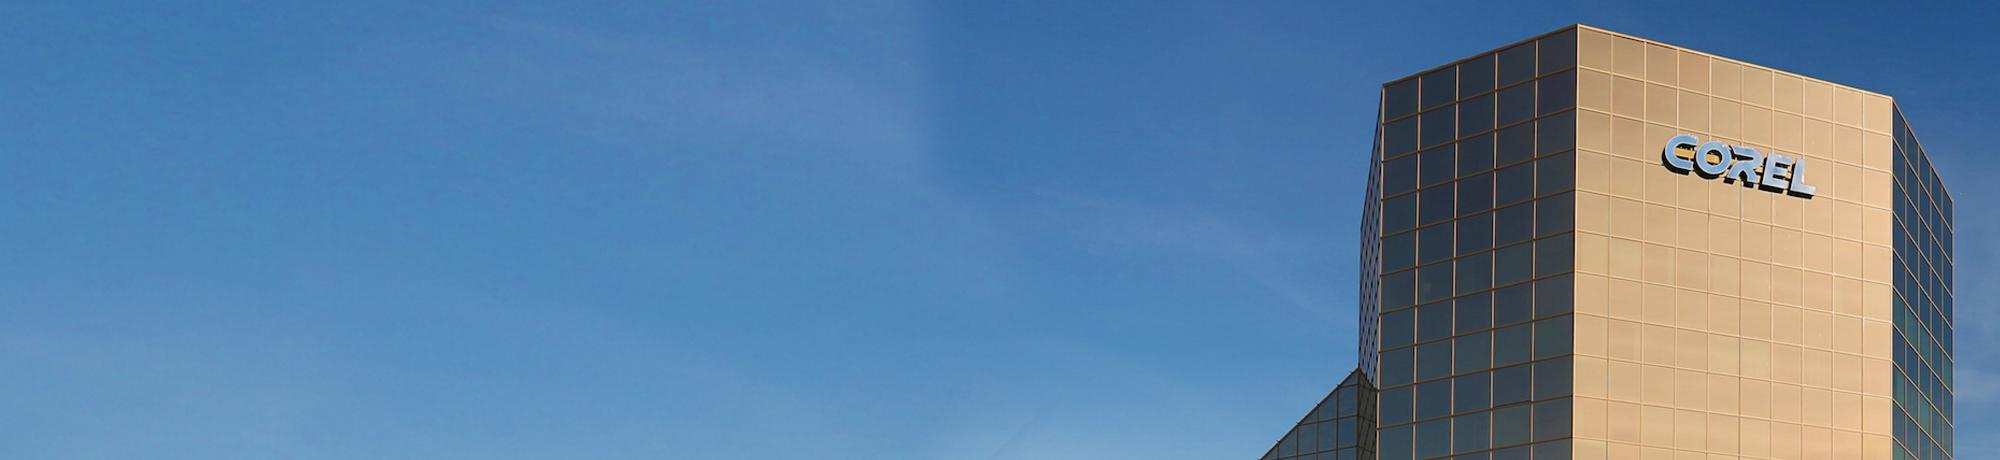 otris contract Vertragsmanagement, Vertragsverwaltung Software - Referenzbericht Corel - Banner